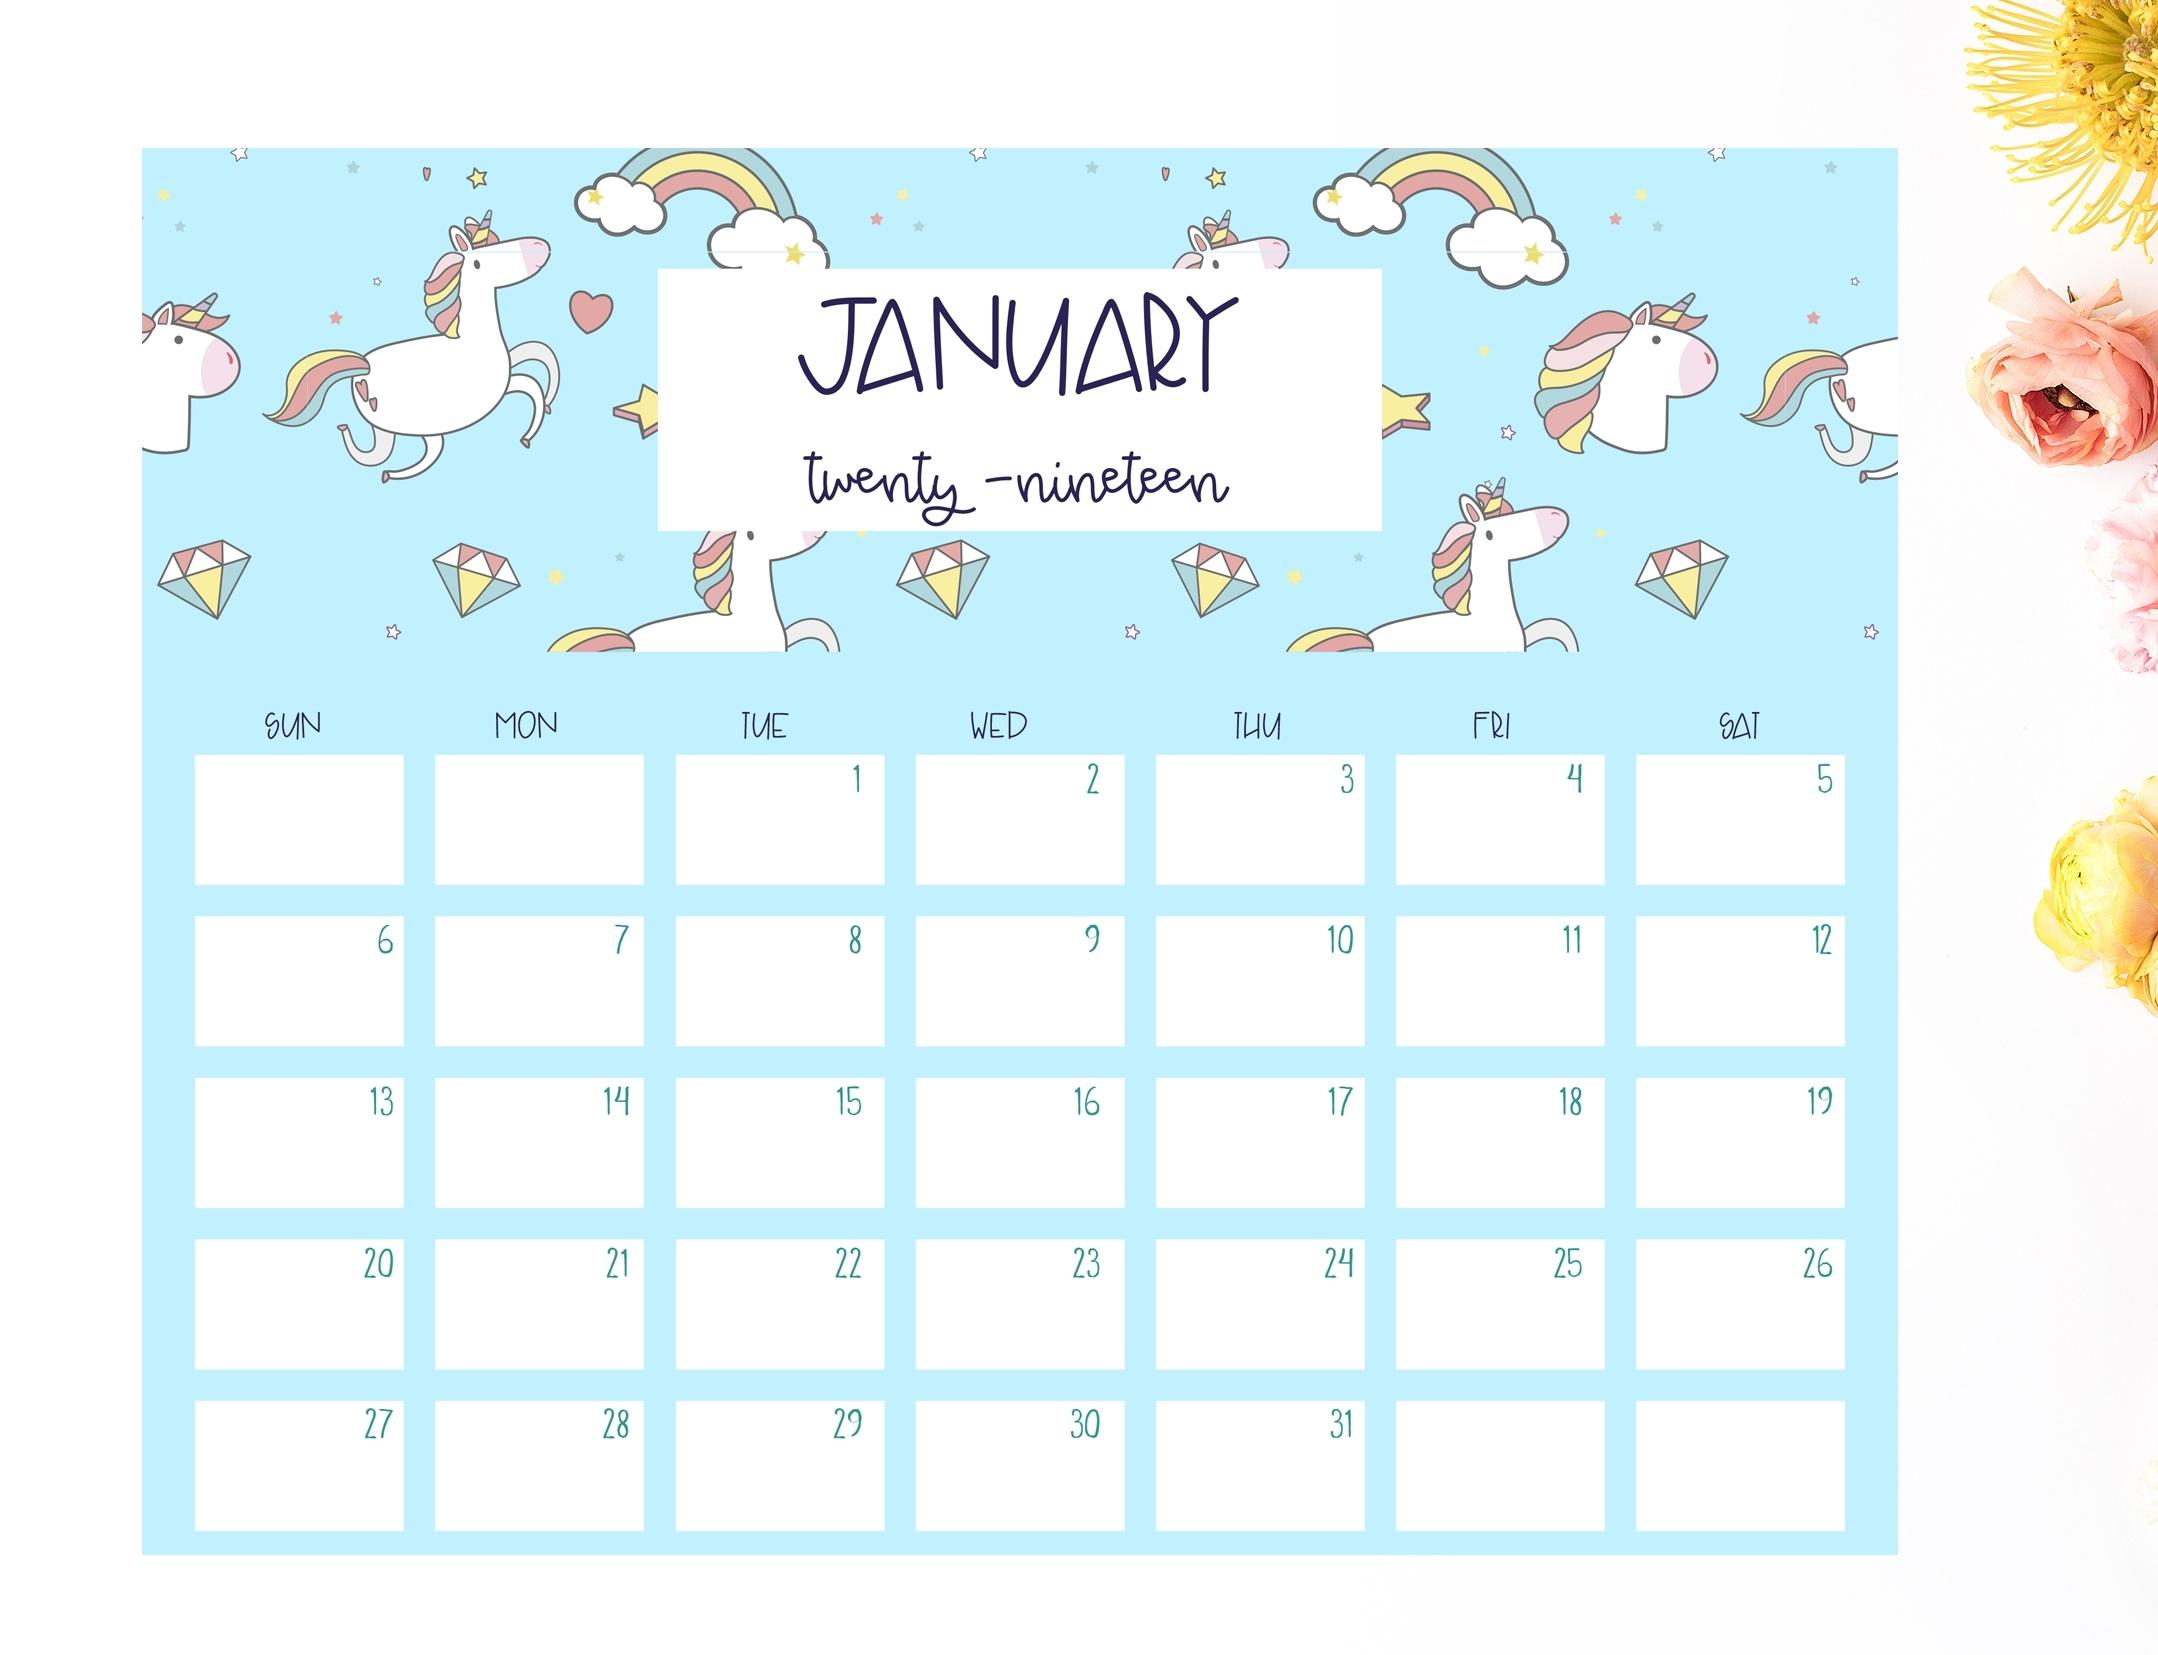 Free 2019 Unicorn Calendar - Shabby Mint Chic Party